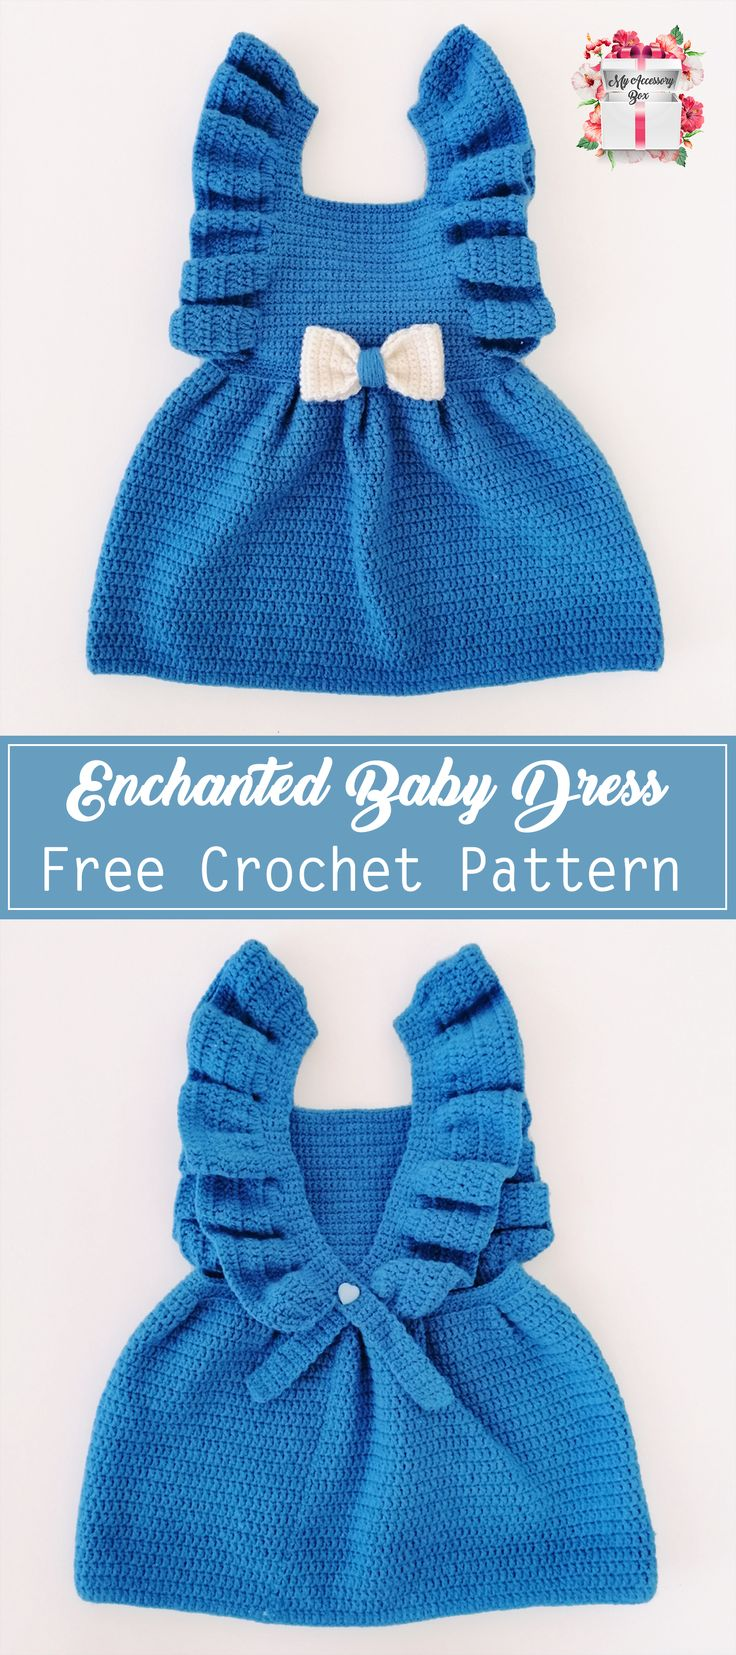 Heart Baby Hat Free Knitting Pattern Freeknittingpattern Knittinghatpattern Heartpattern